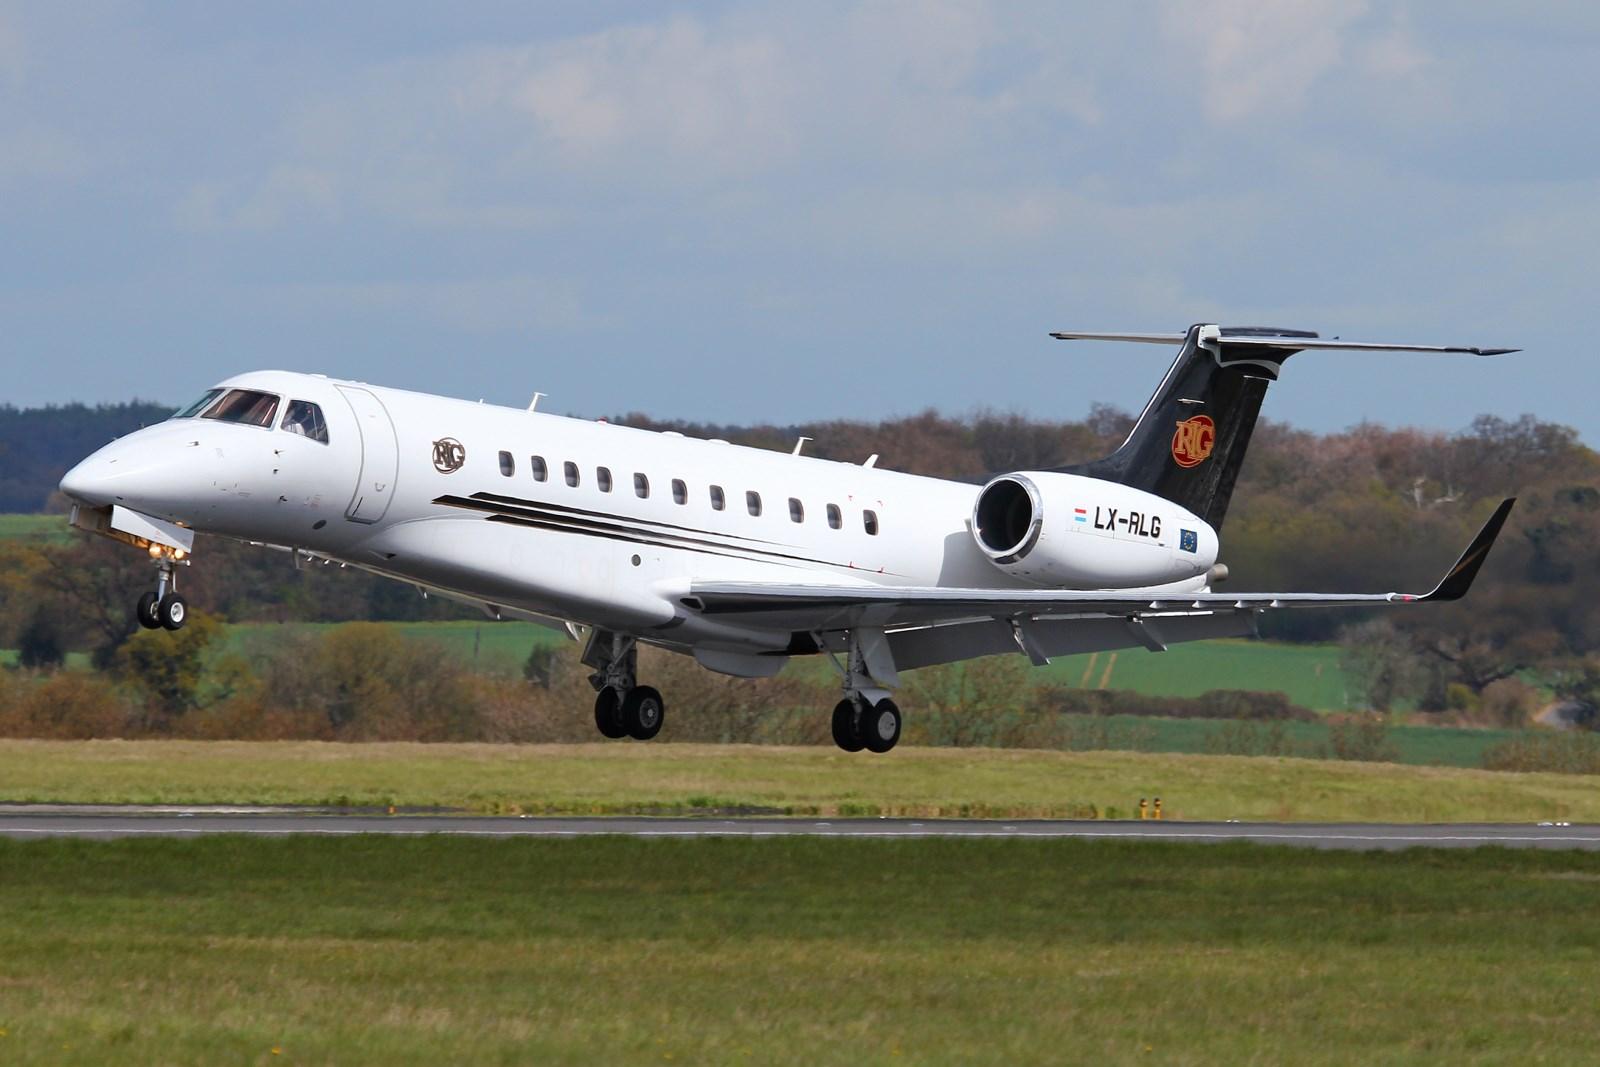 leor yudelowitz rlg 1 - Embraer Legacy 600